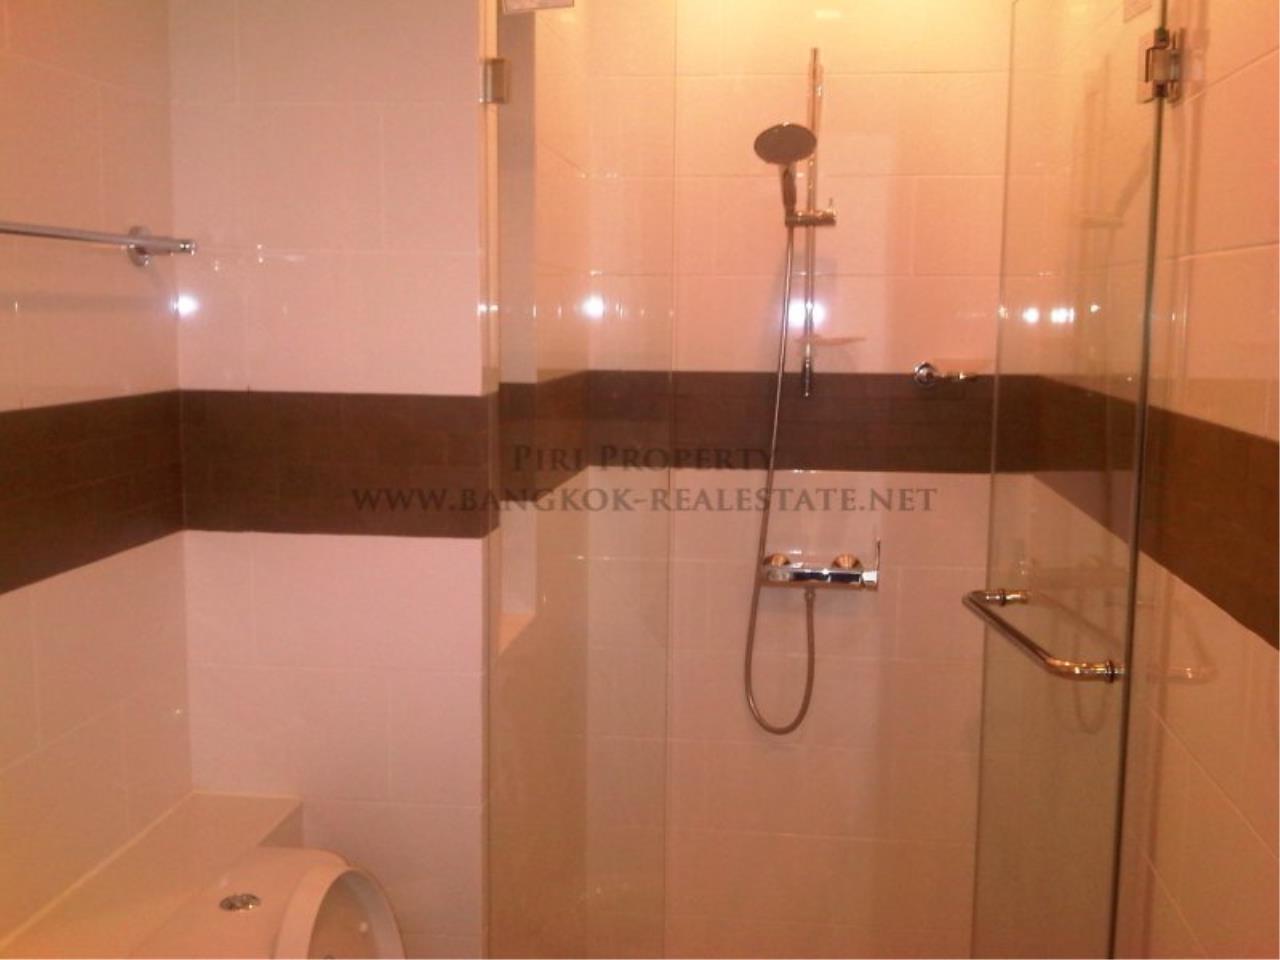 Piri Property Agency's 2 Bedroom - Modern and Brand New - IDEO Verve 7